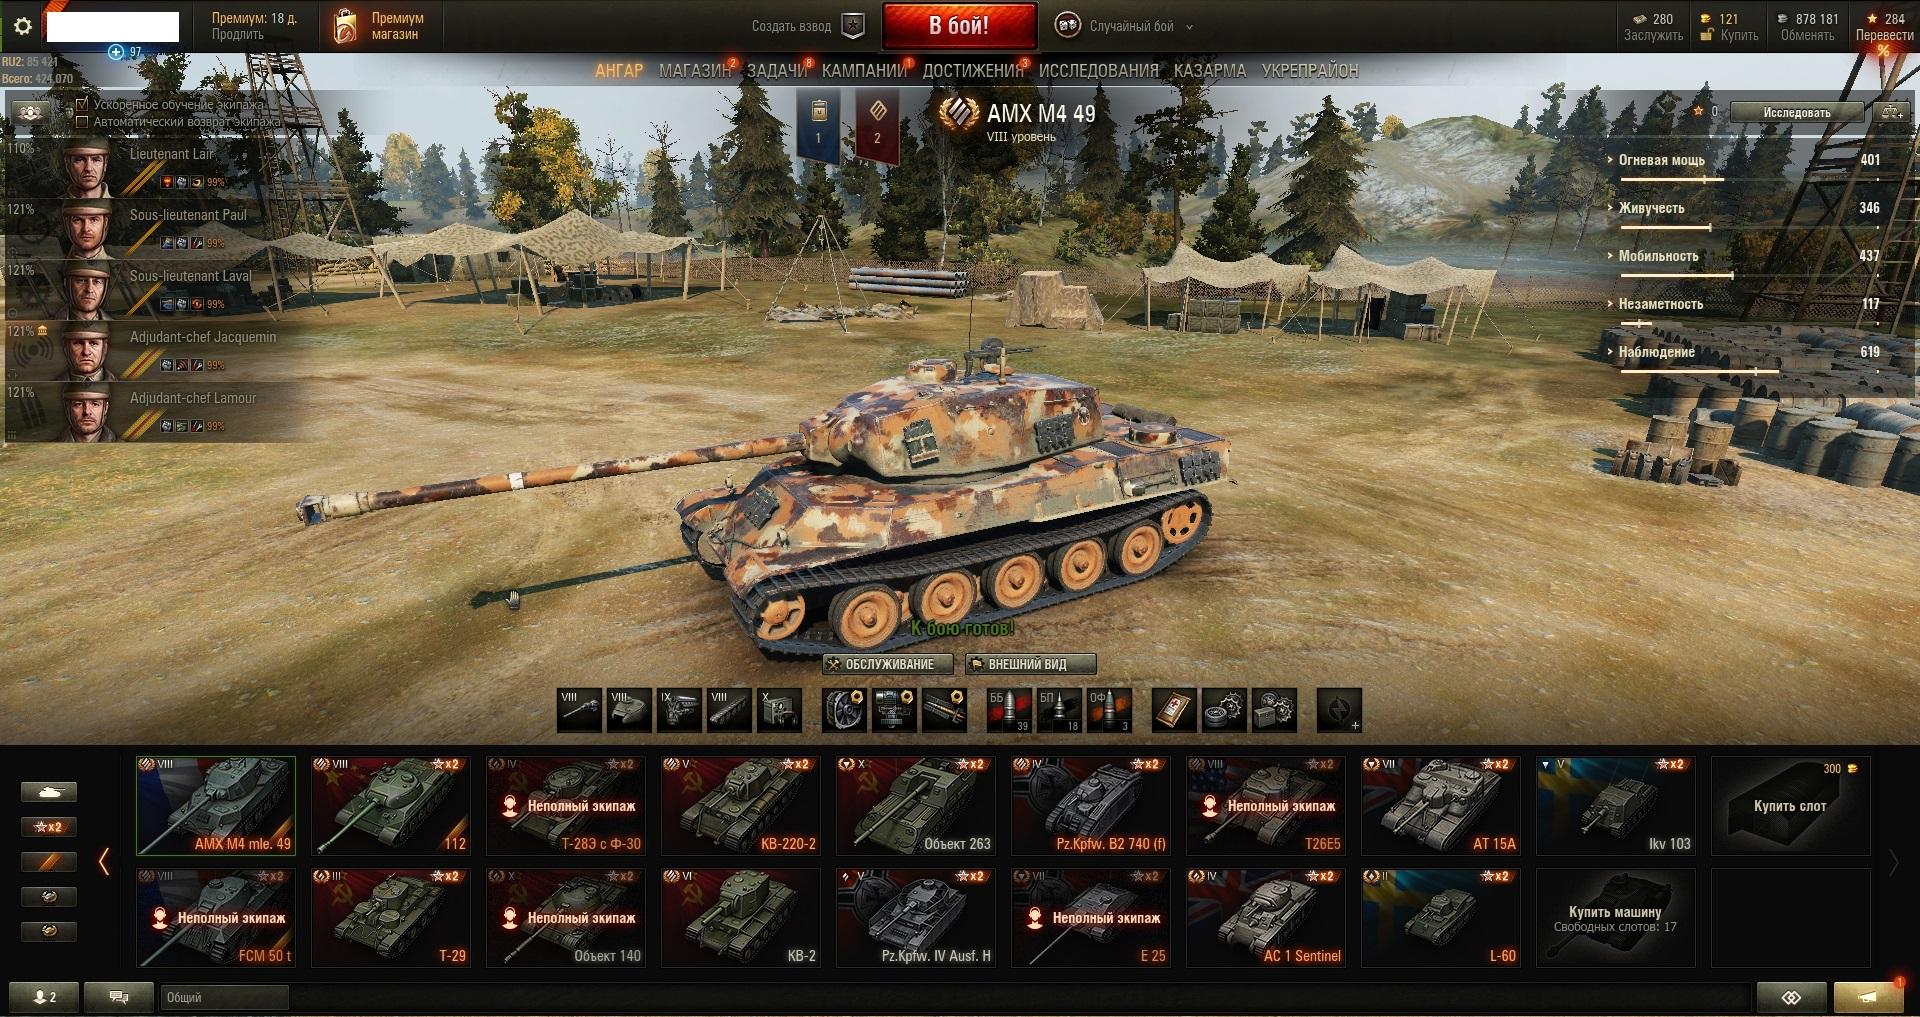 WoT World of Tanks Аккаунт с эксклюзивами №5